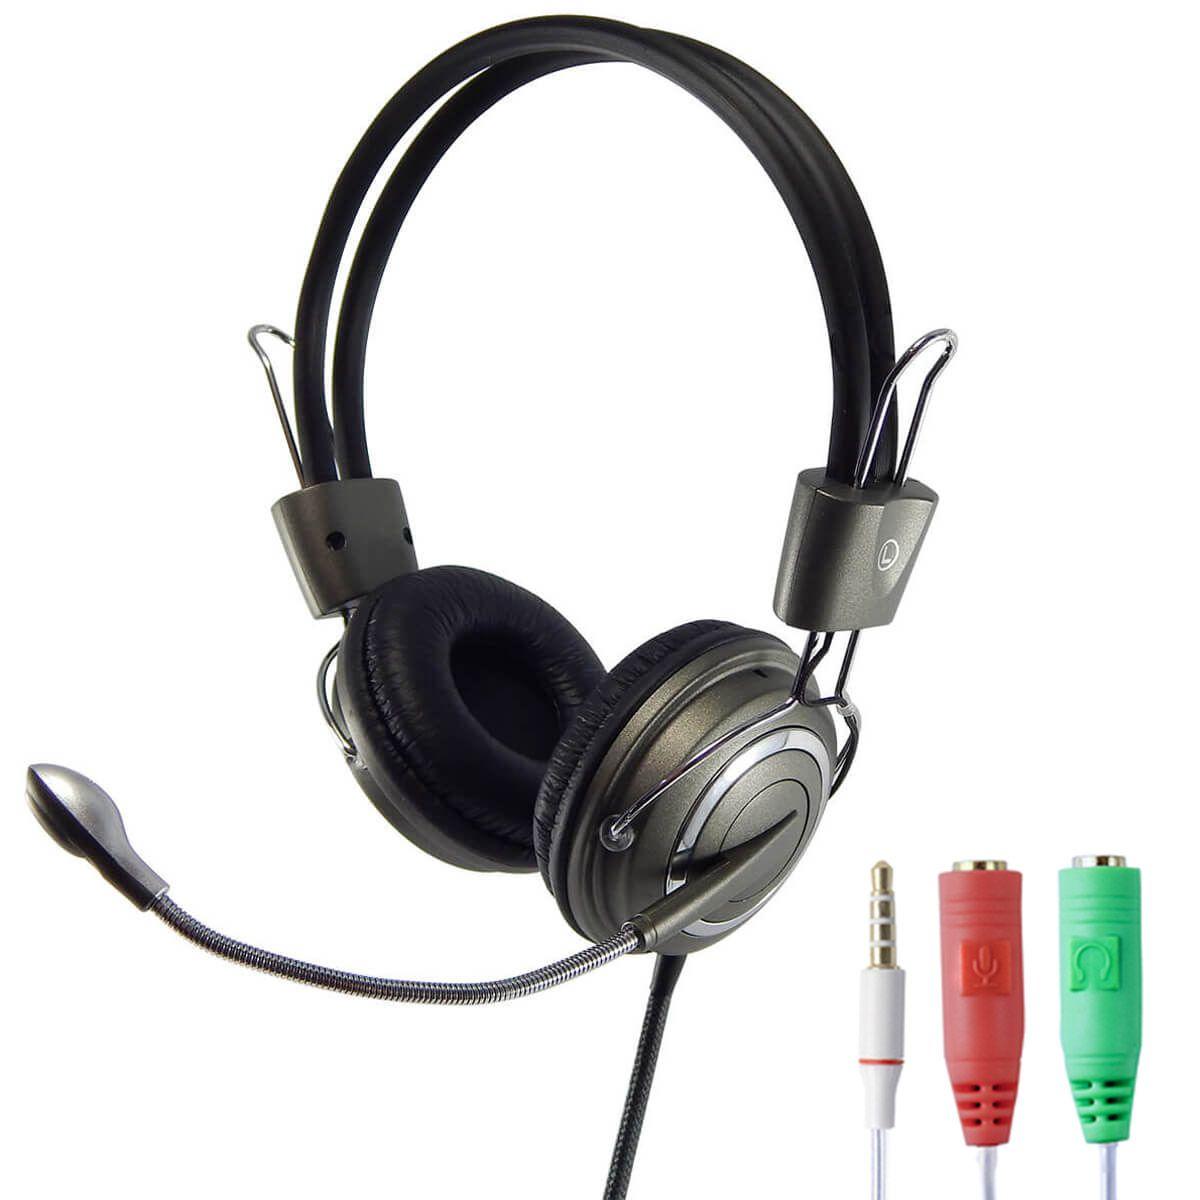 KIT Headset com Microfone Infokit HM-650MV com Adaptador P3 x P2